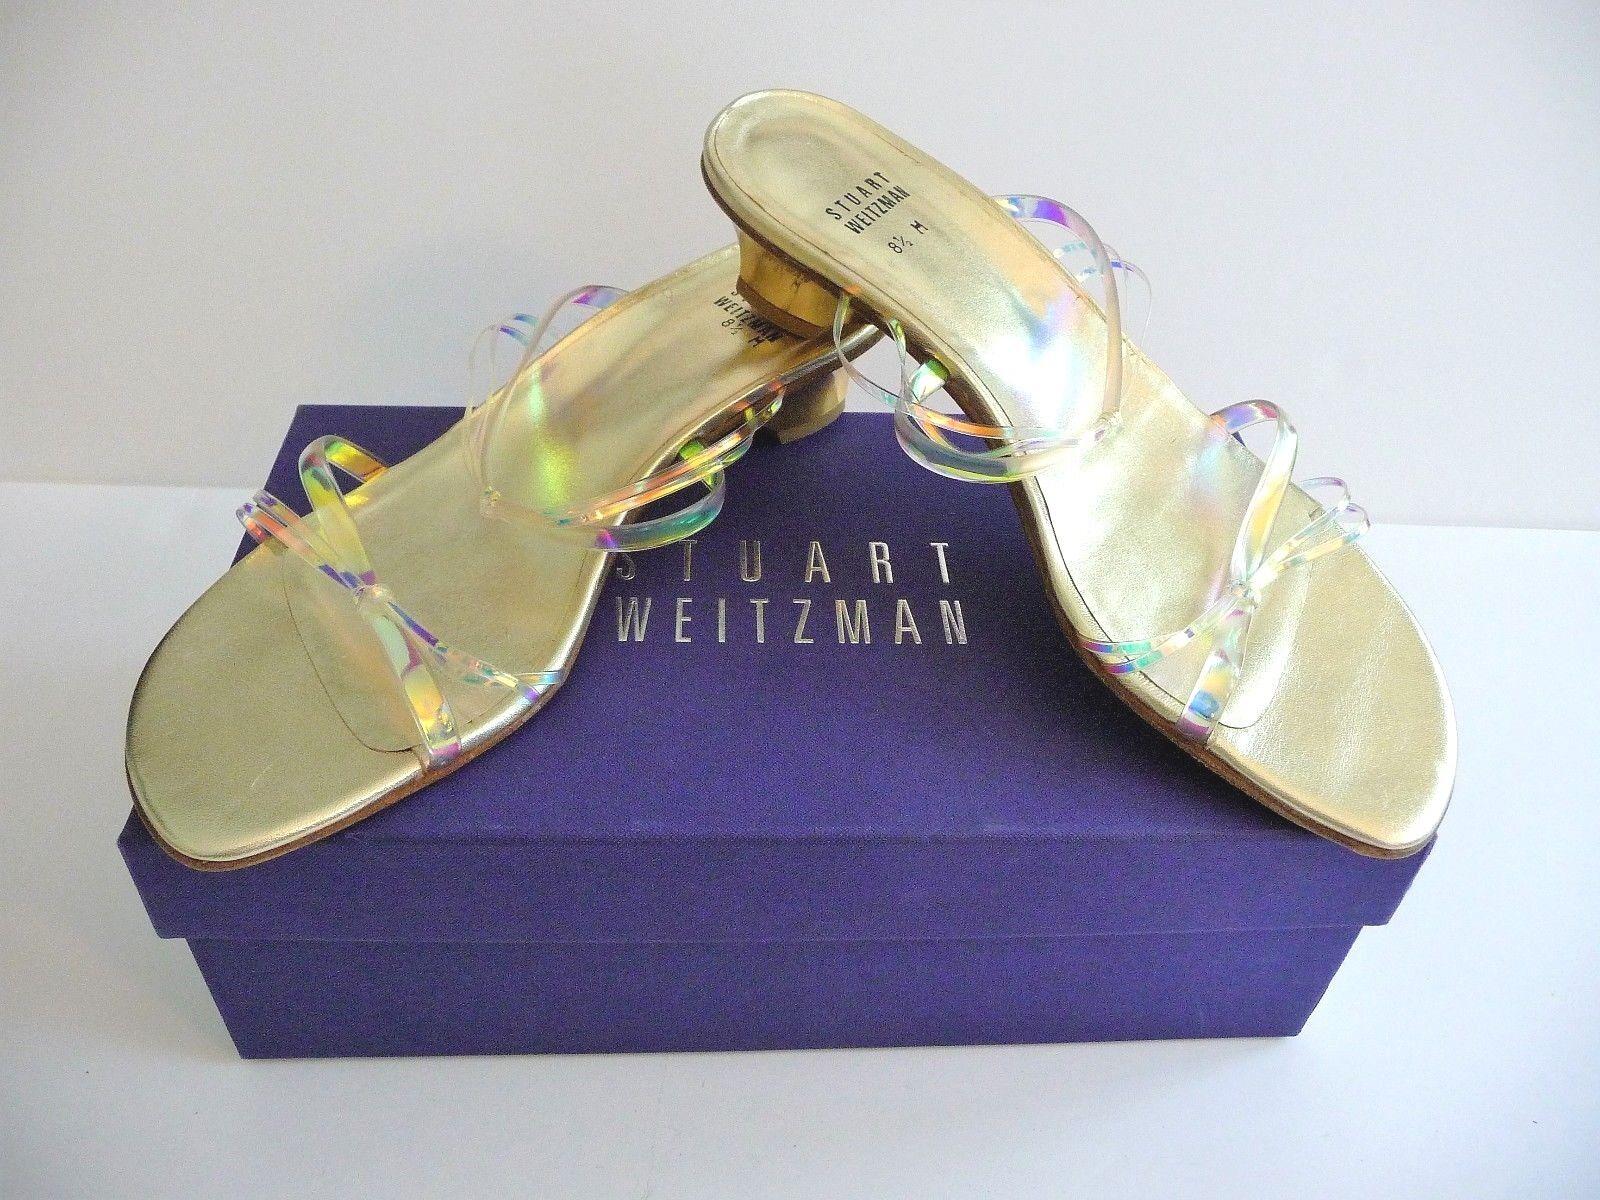 Stuart Weitzman NIB Iridescent gold Low Heel Slide Sandals Size 8.5B Retail  325